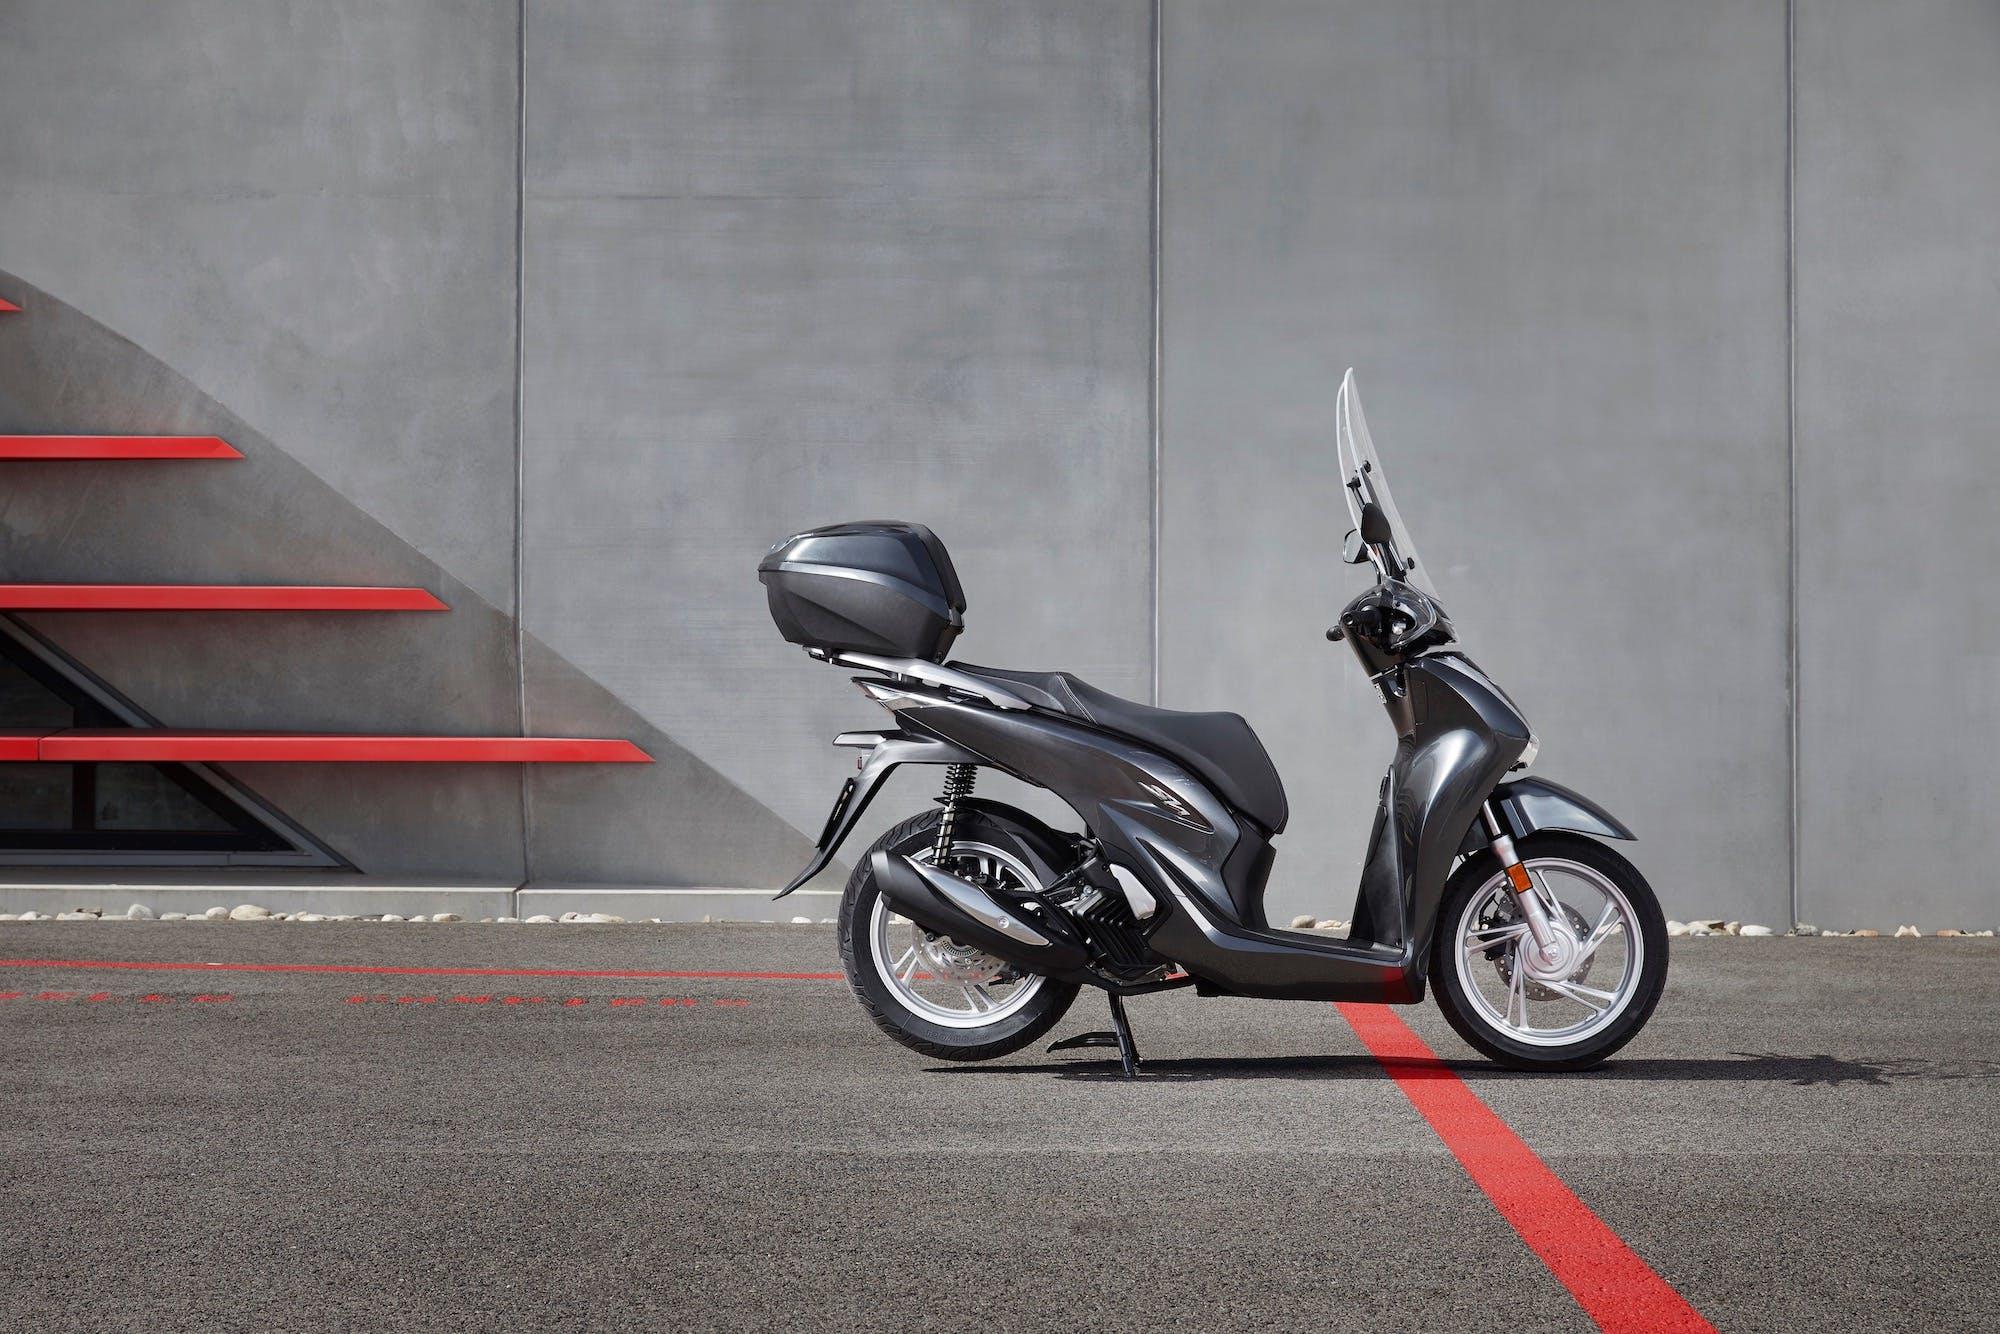 Honda SH 125 2020 Grigio miglior scooter 125